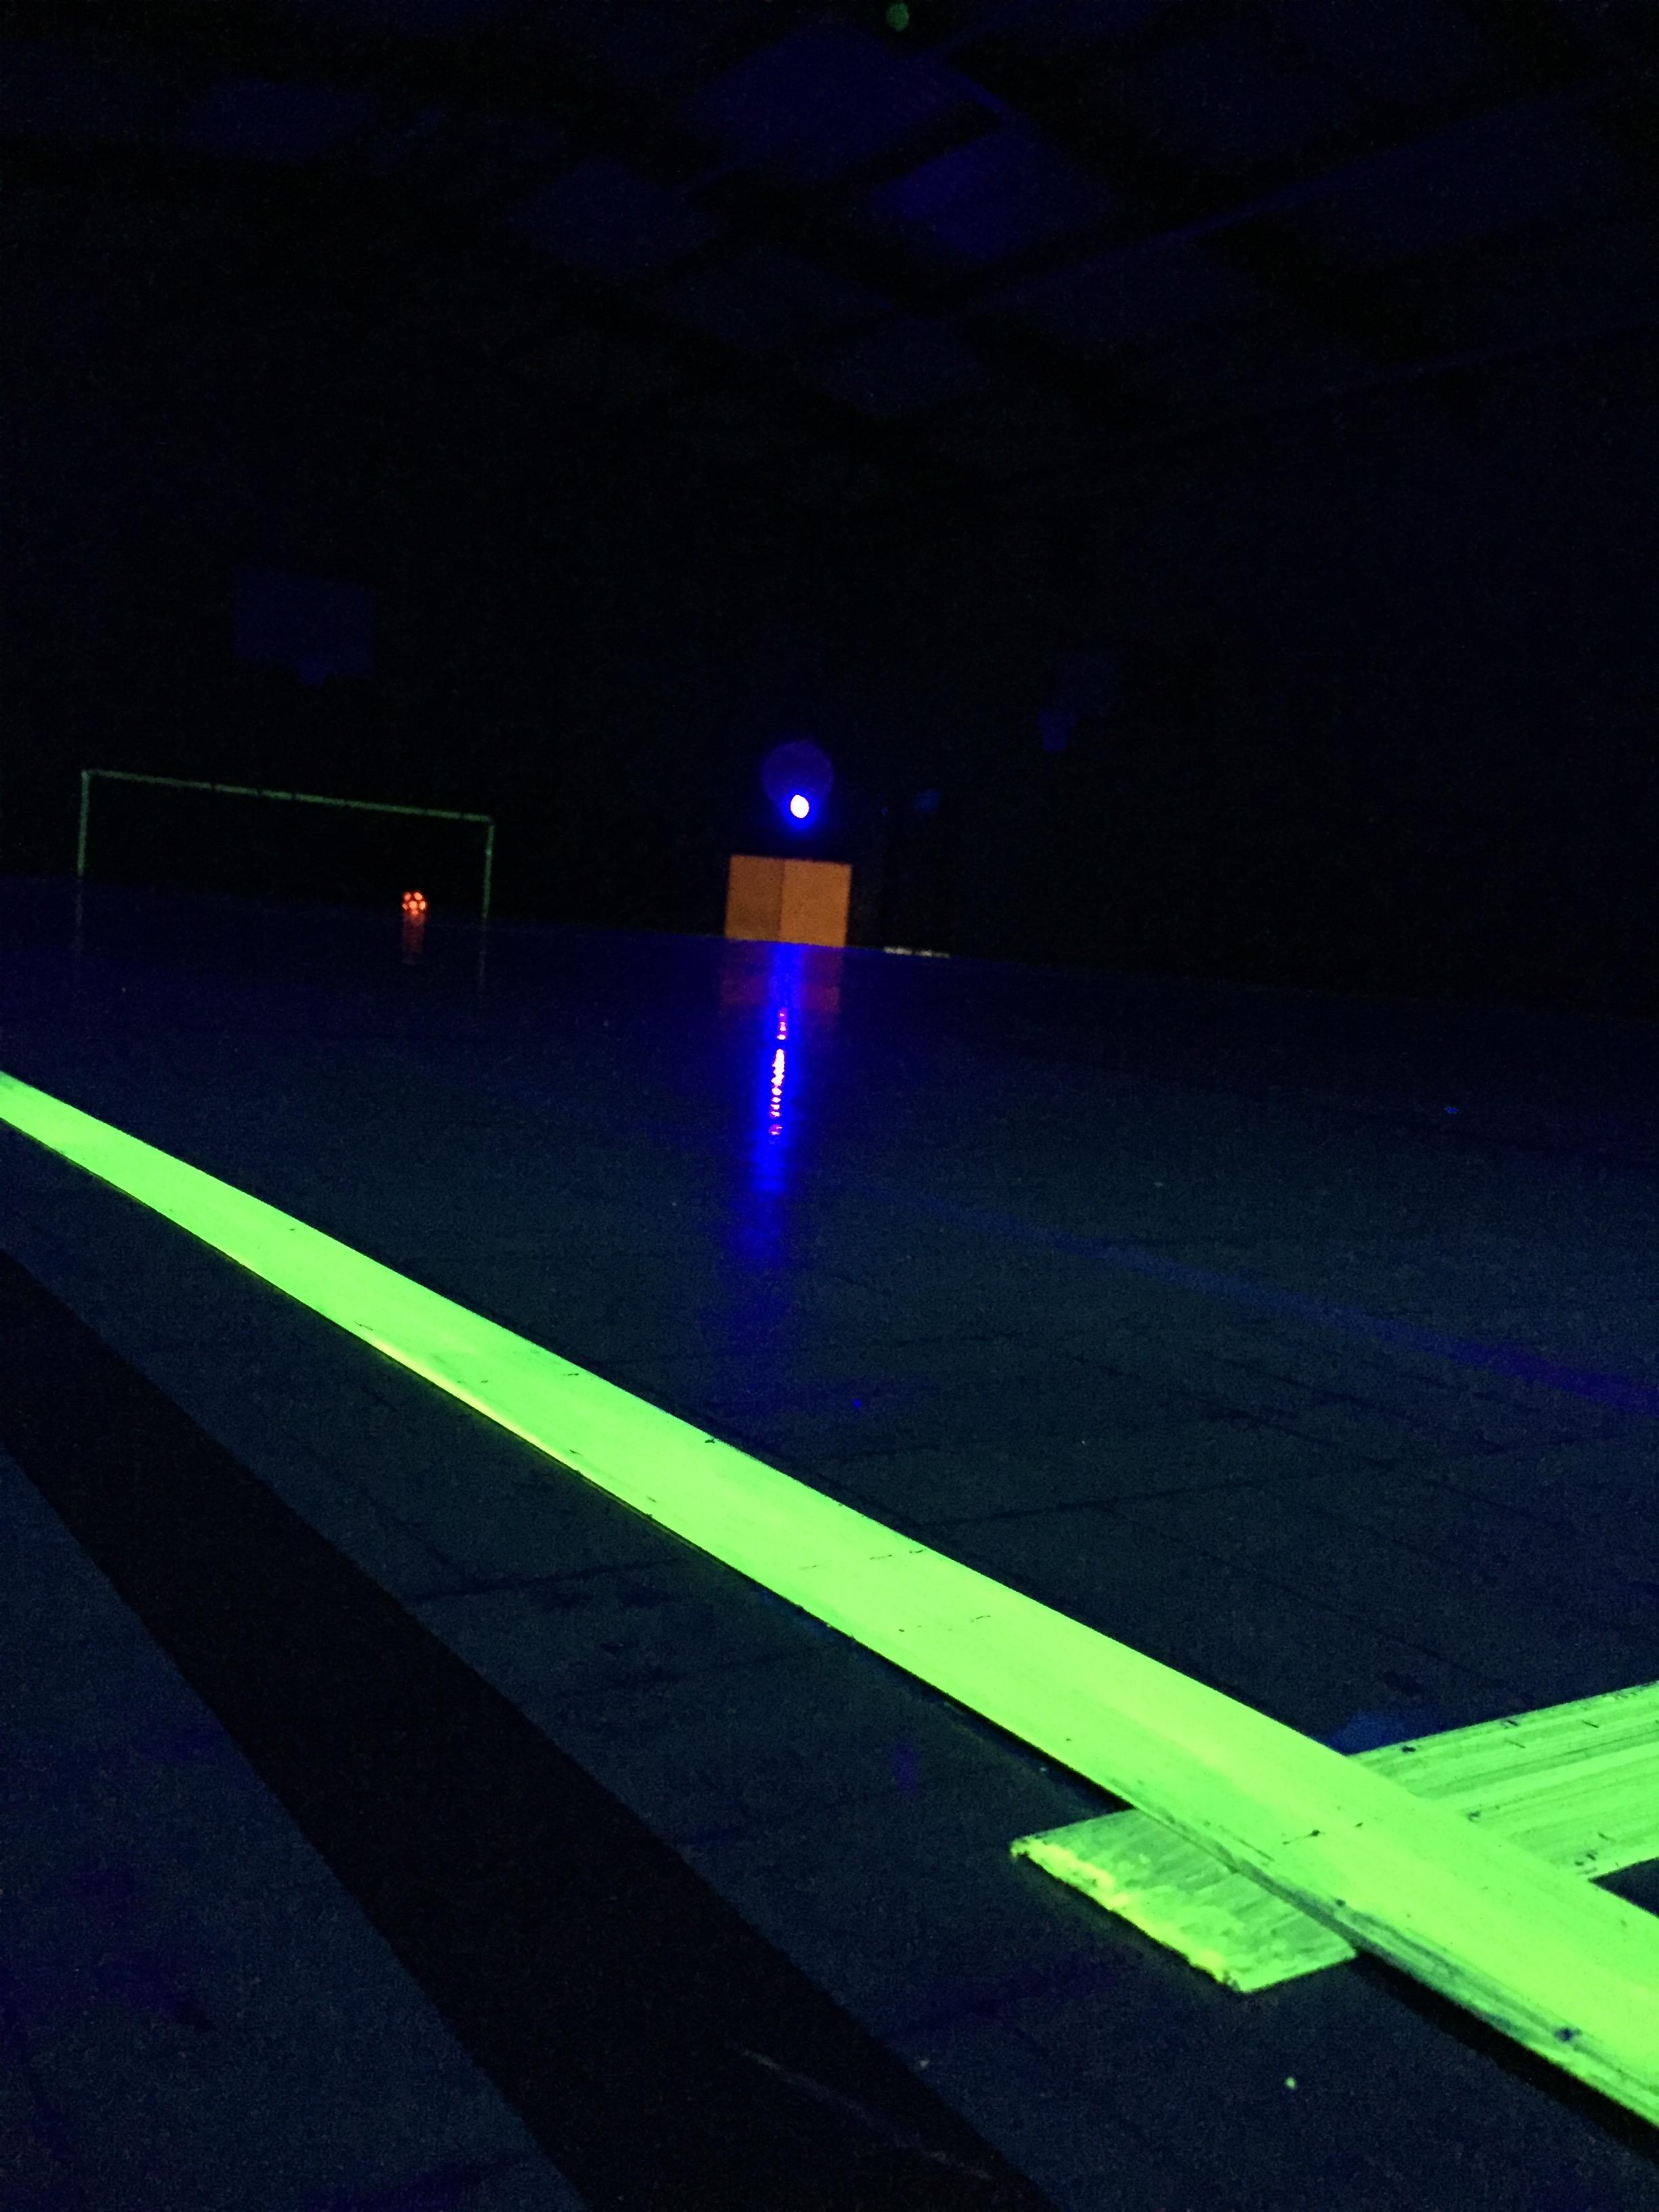 The illuminated pitch